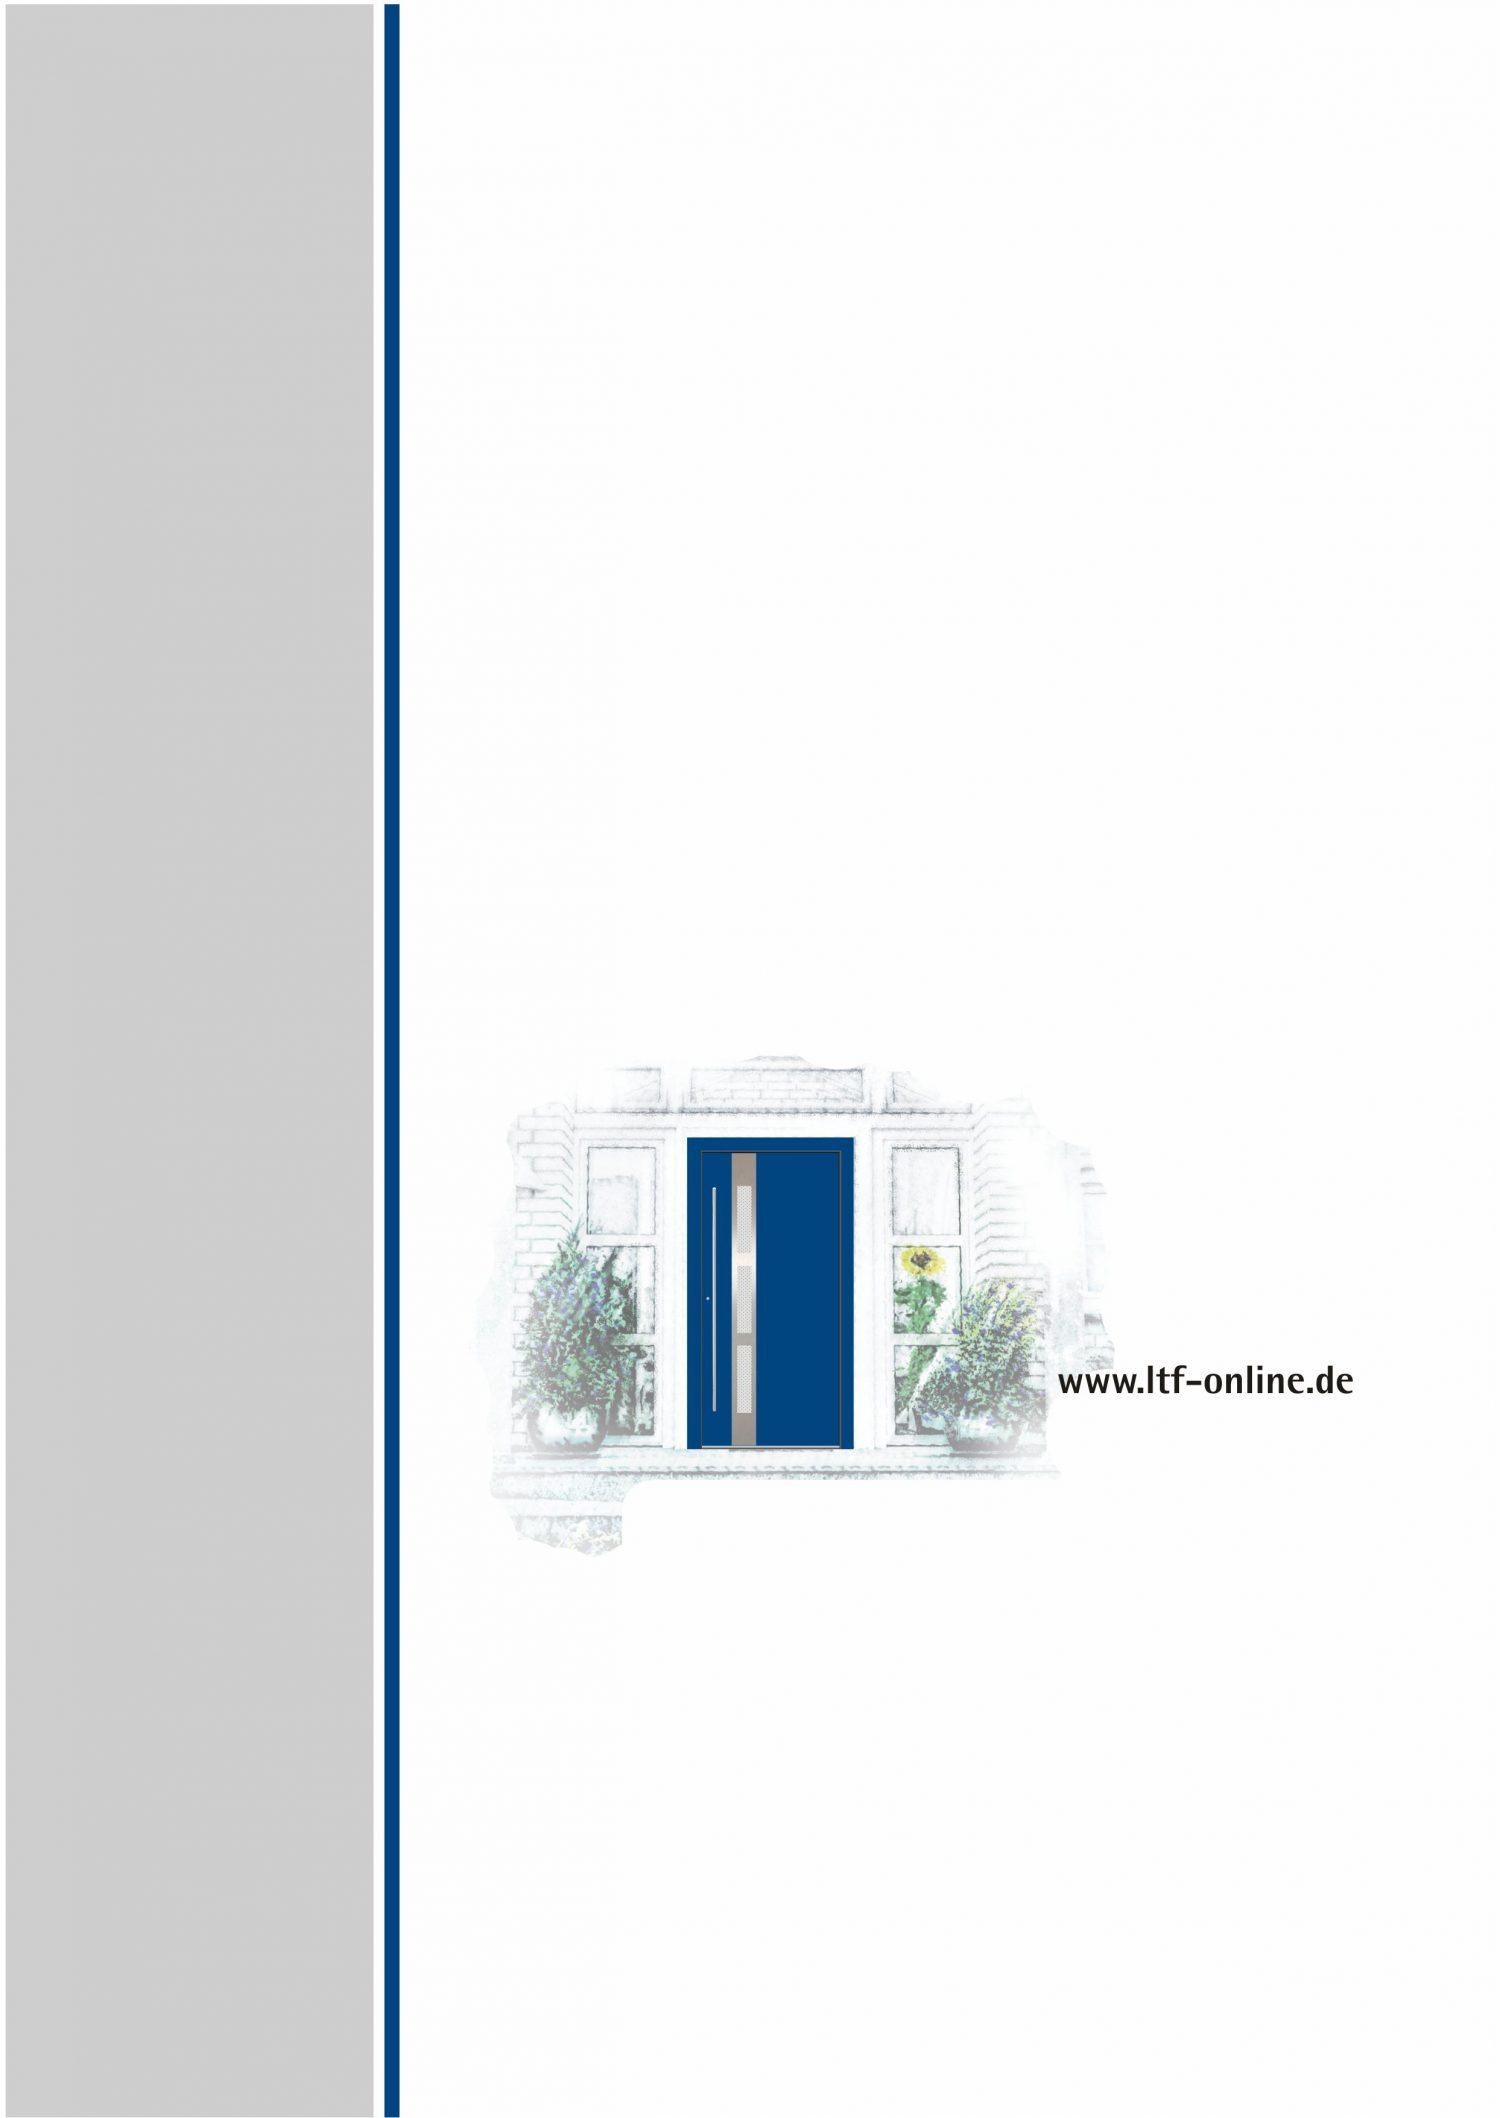 Haustürfüllungen LTF Katalog